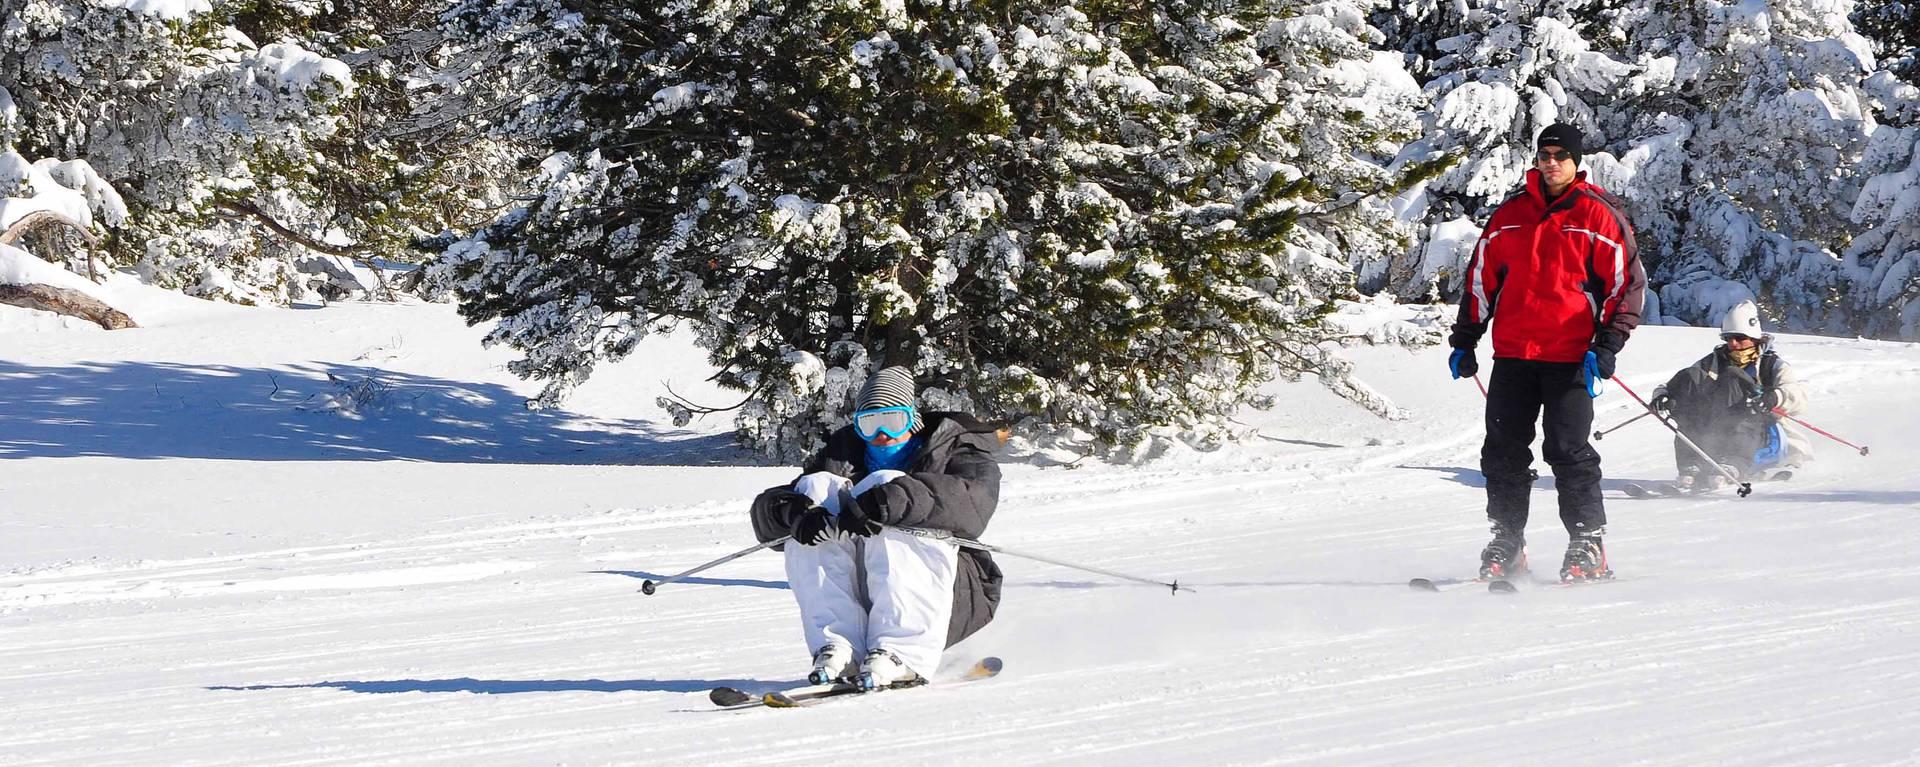 Les skieurs © F. Berlic